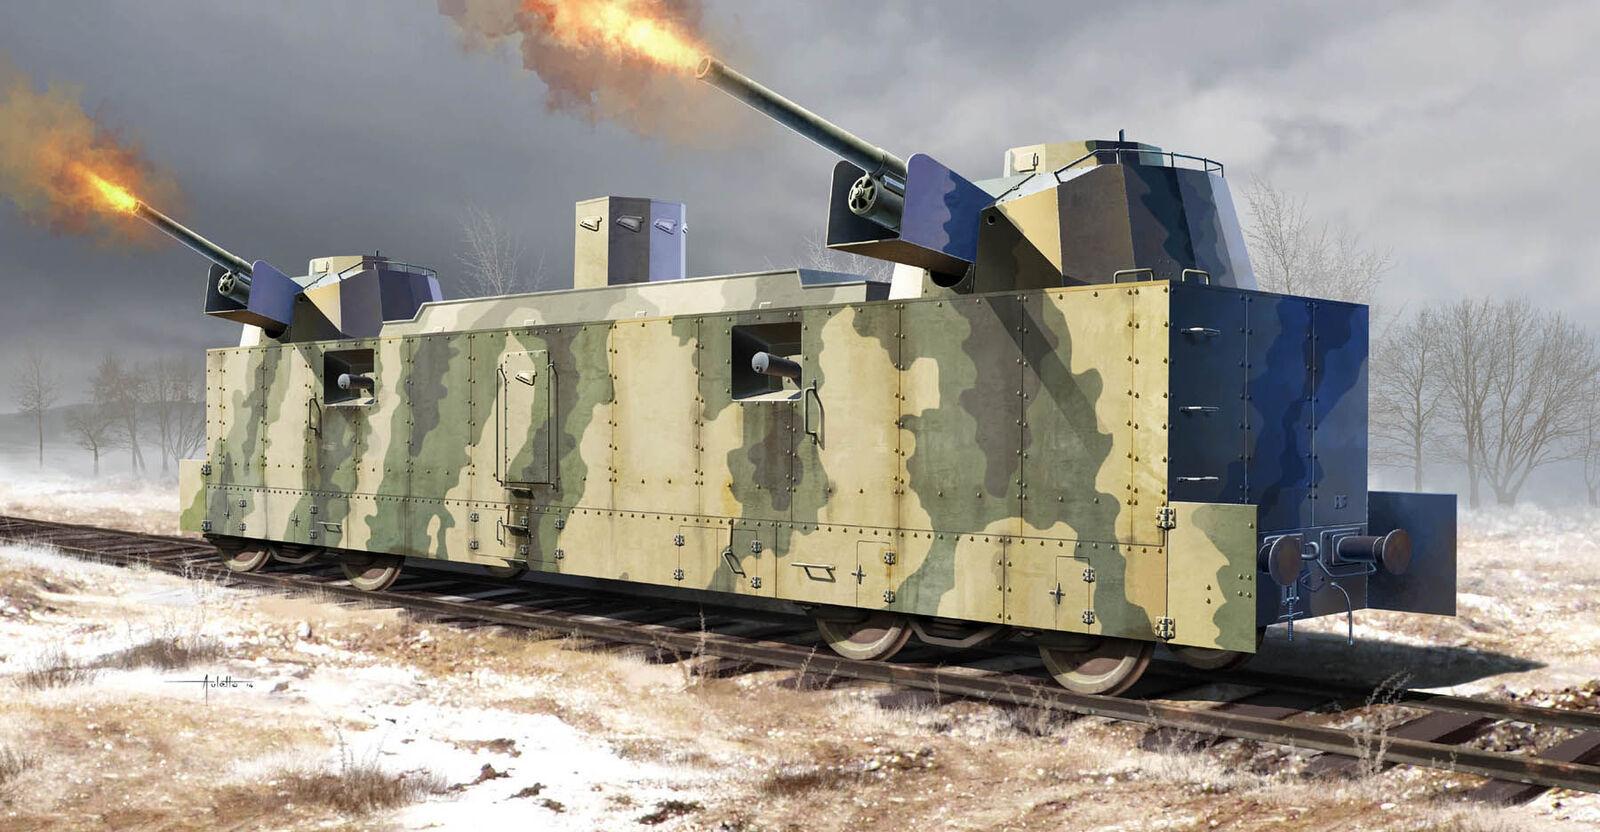 Trumpeter 00222 - 1 35 Soviet PL-37 Light Artillery Wagon - Neu  | Genialität